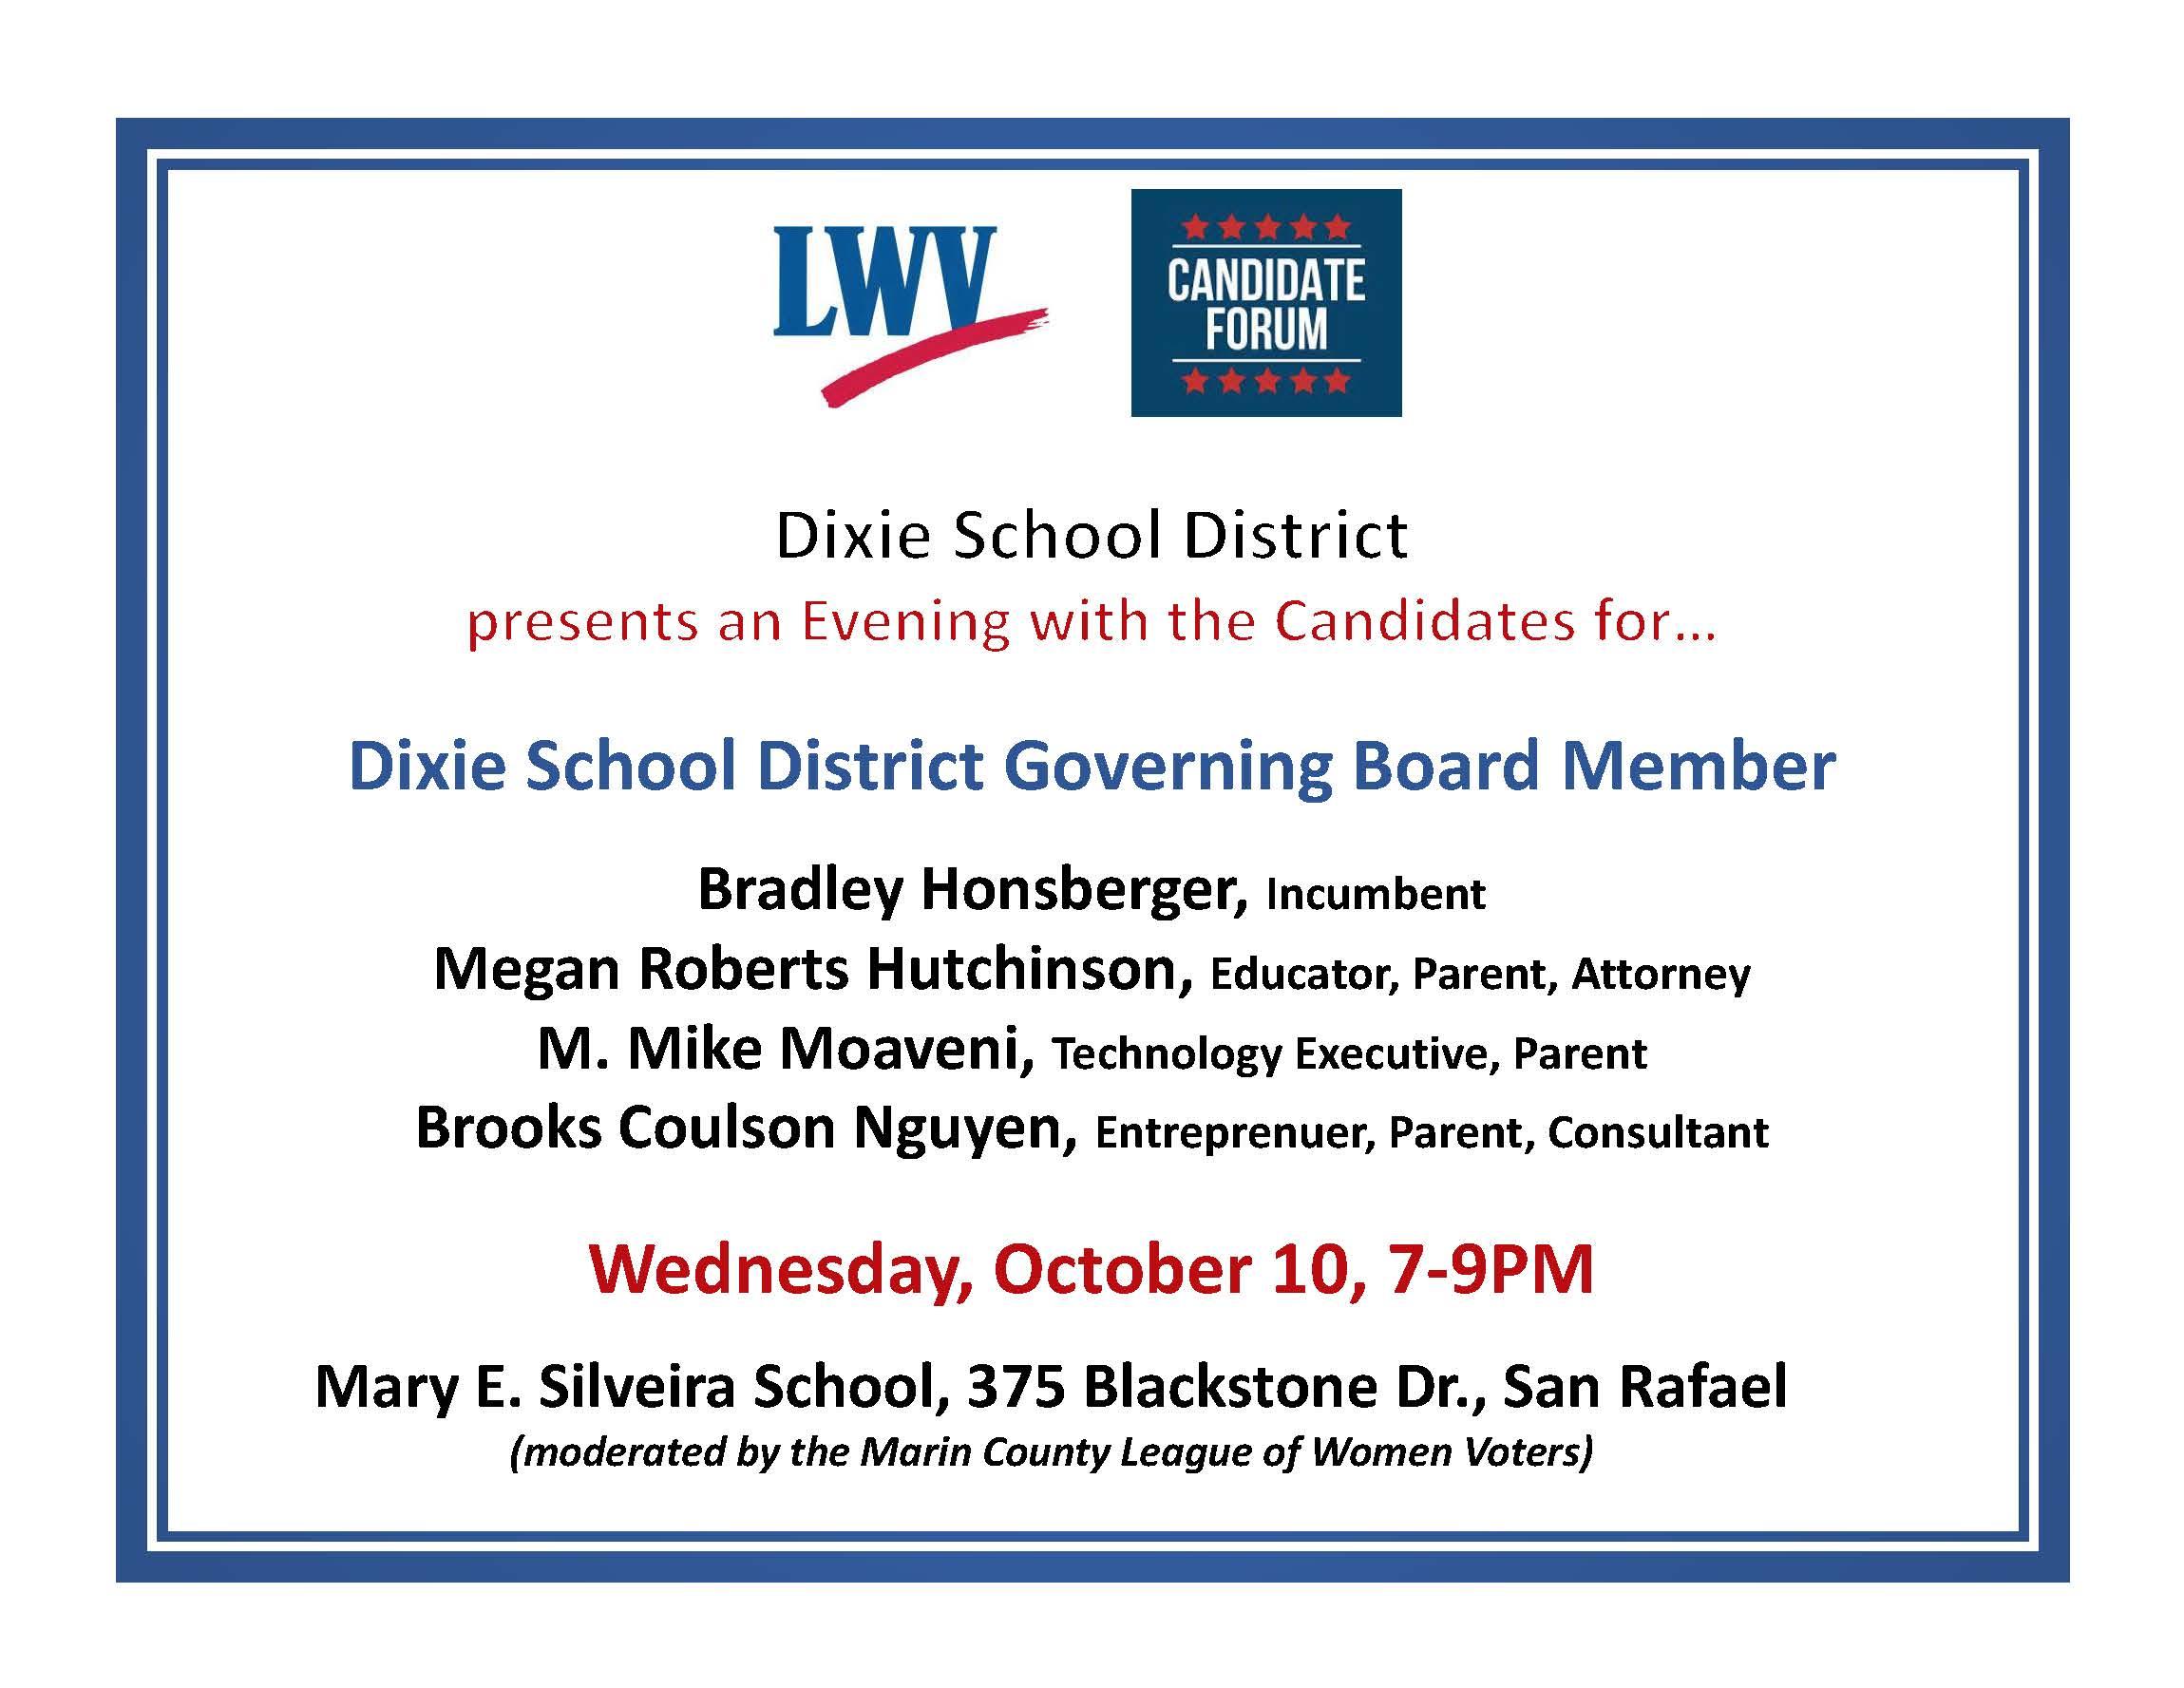 180919-Dixie School District 10.10.jpg